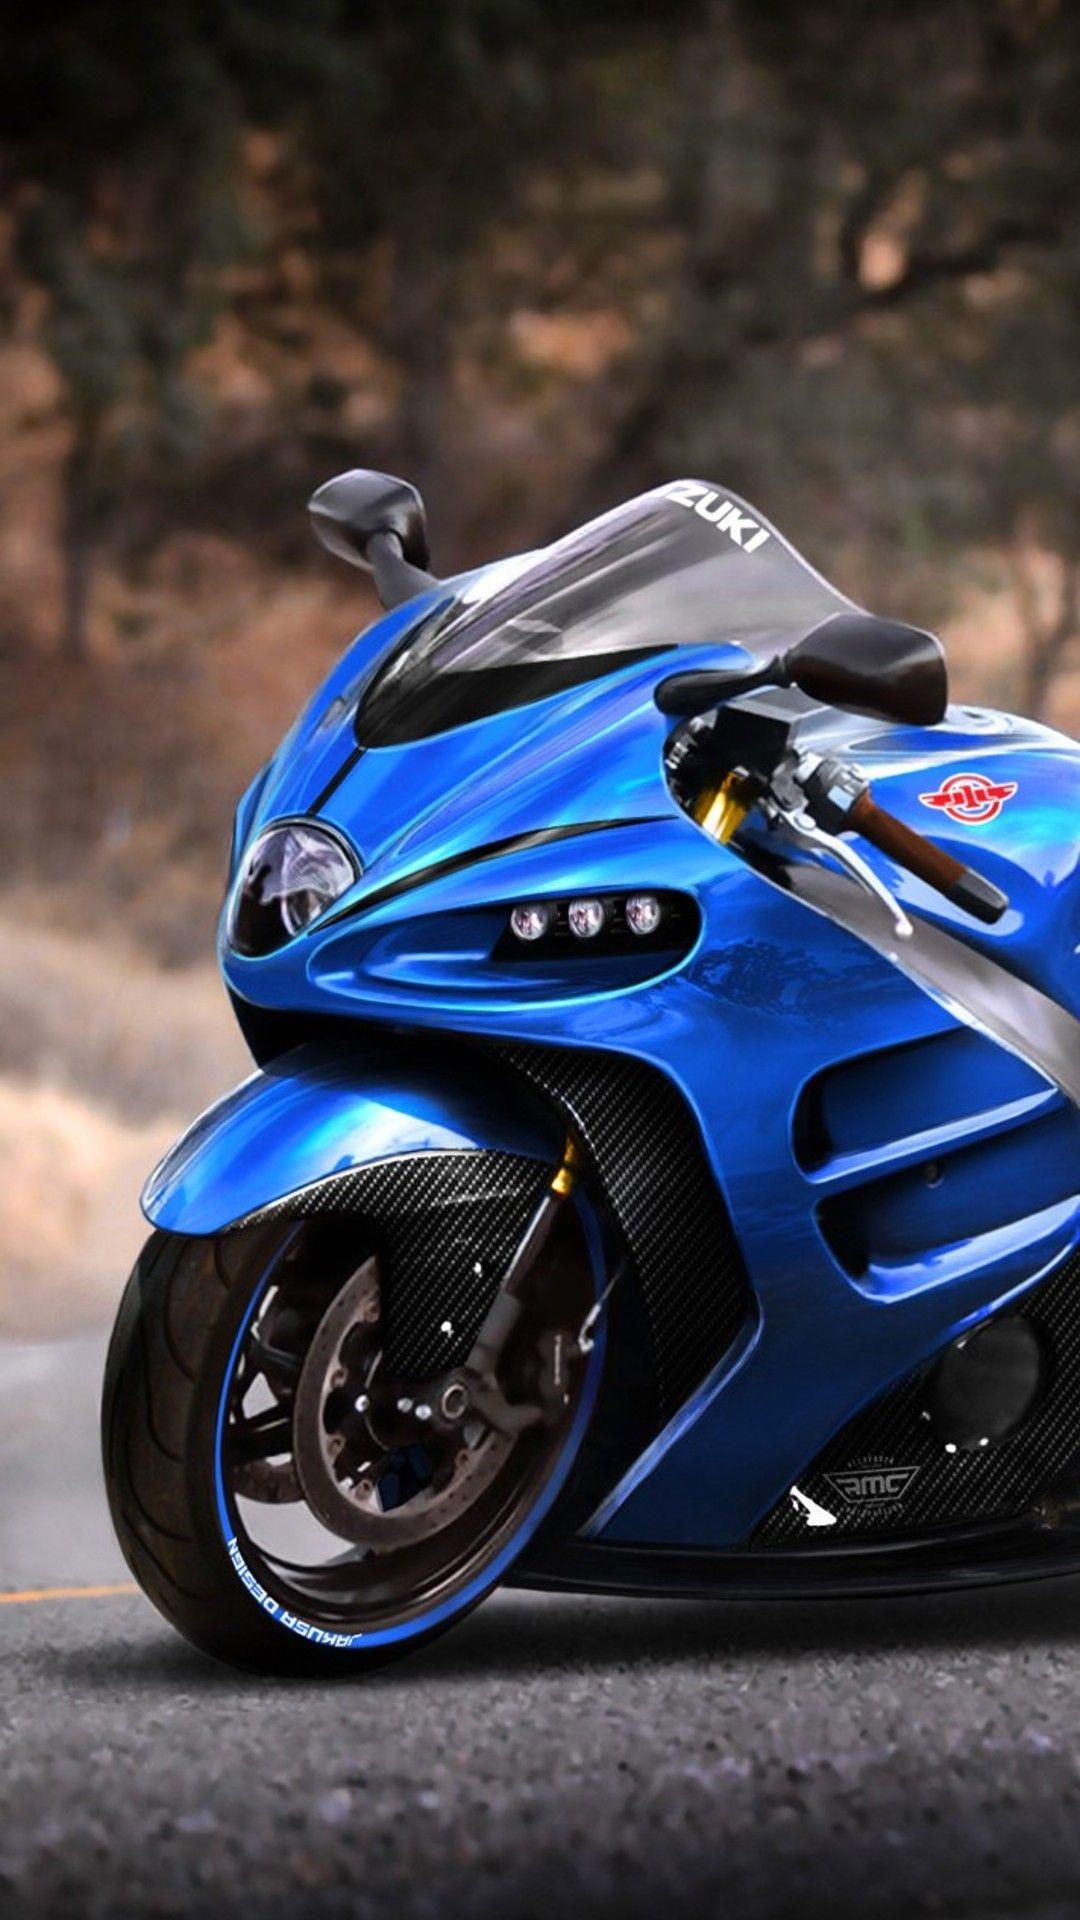 Check Our Store Www Brapwrap Com Motorcycle Gear Jackets Hoodies Rings Bracelets Helmets Watches Skull Stu Suzuki Hayabusa Hayabusa Suzuki